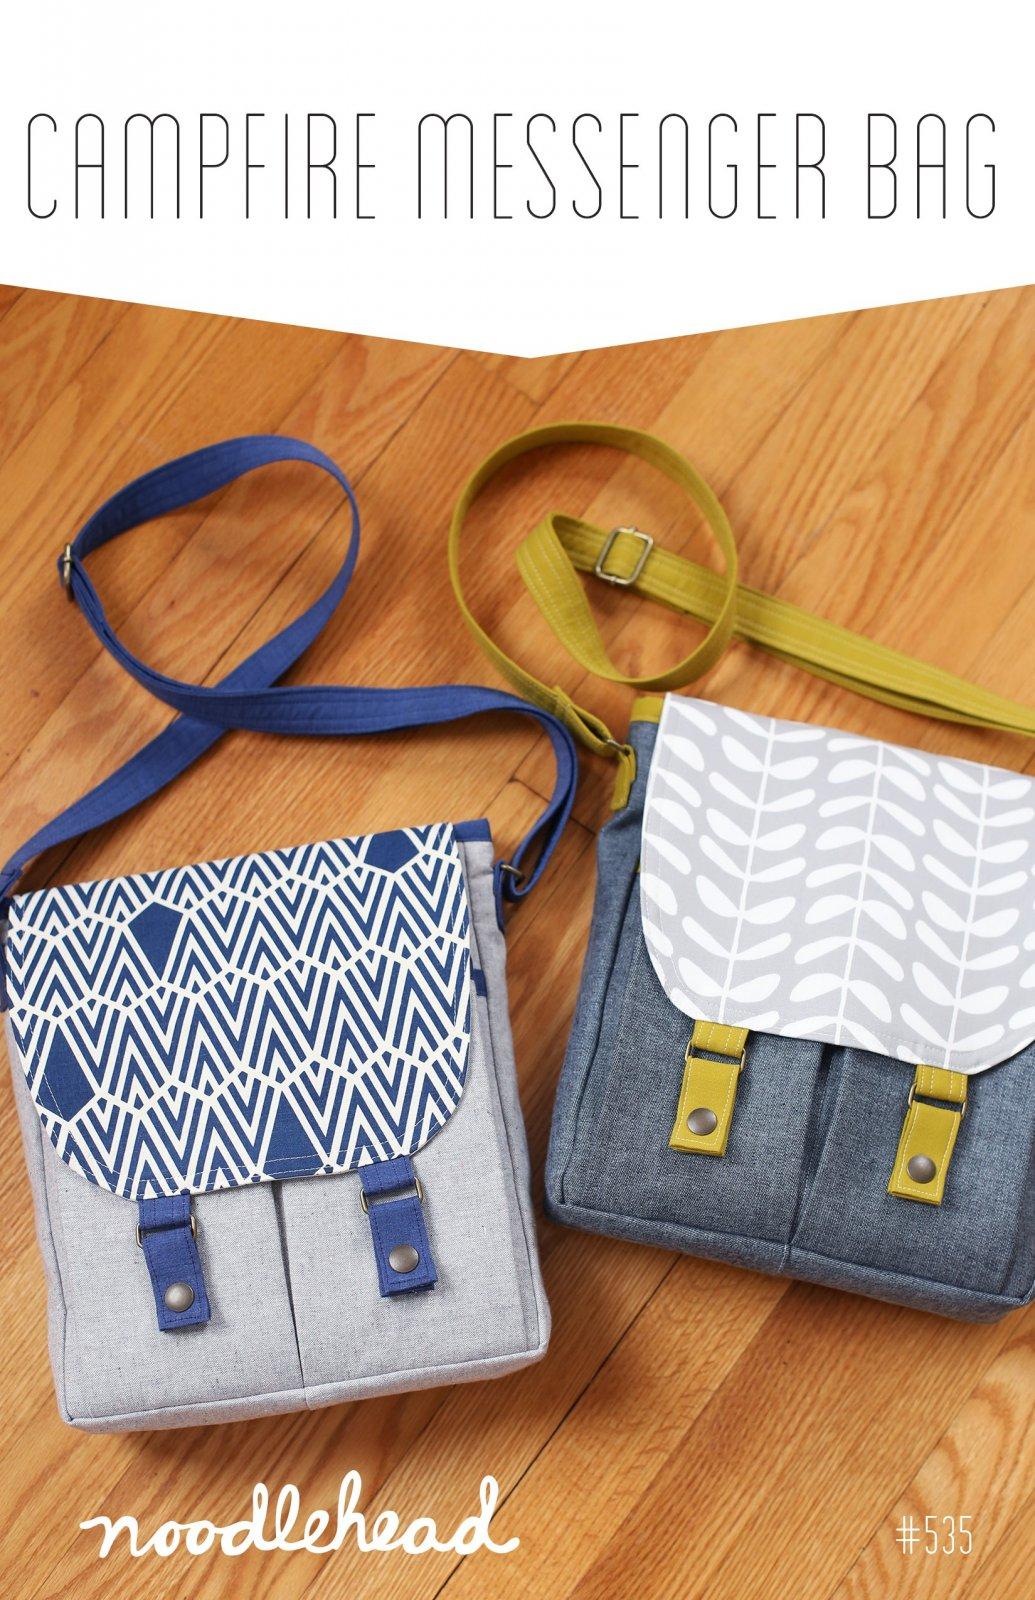 Campfire Messenger Bag